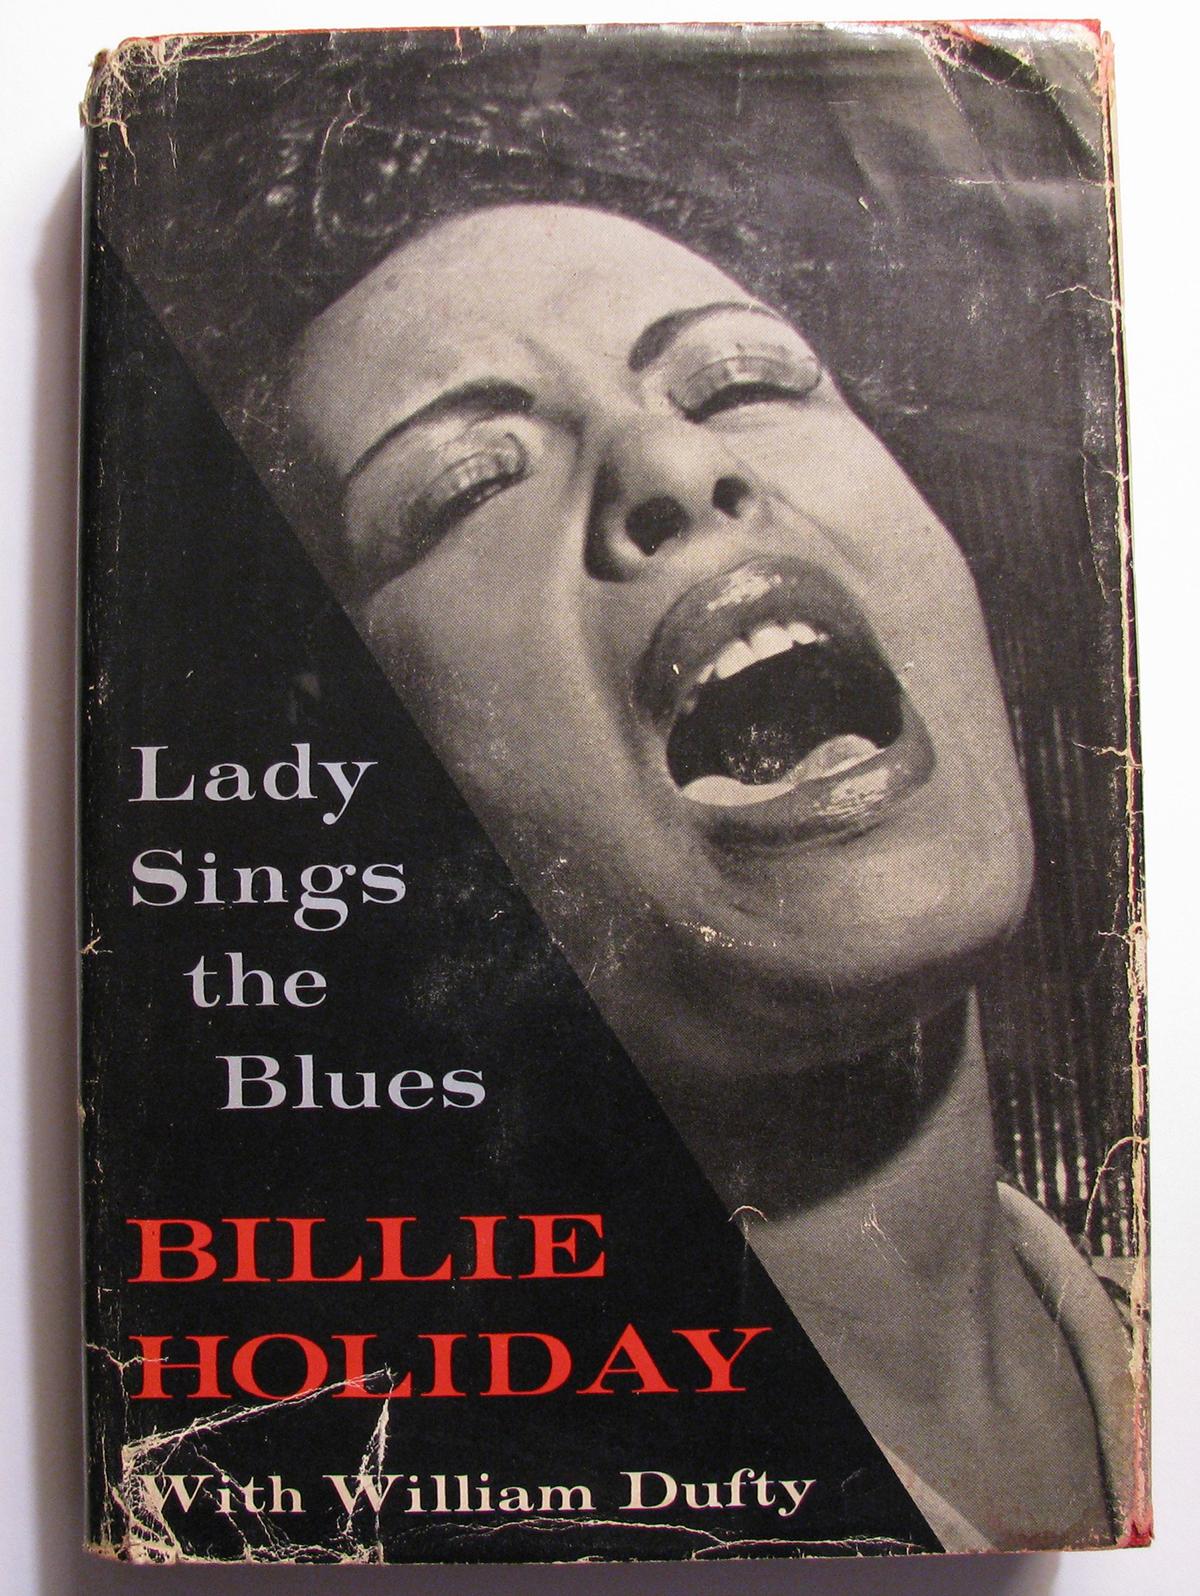 Billie Holiday  Good Morning Heartache Lyrics Meaning